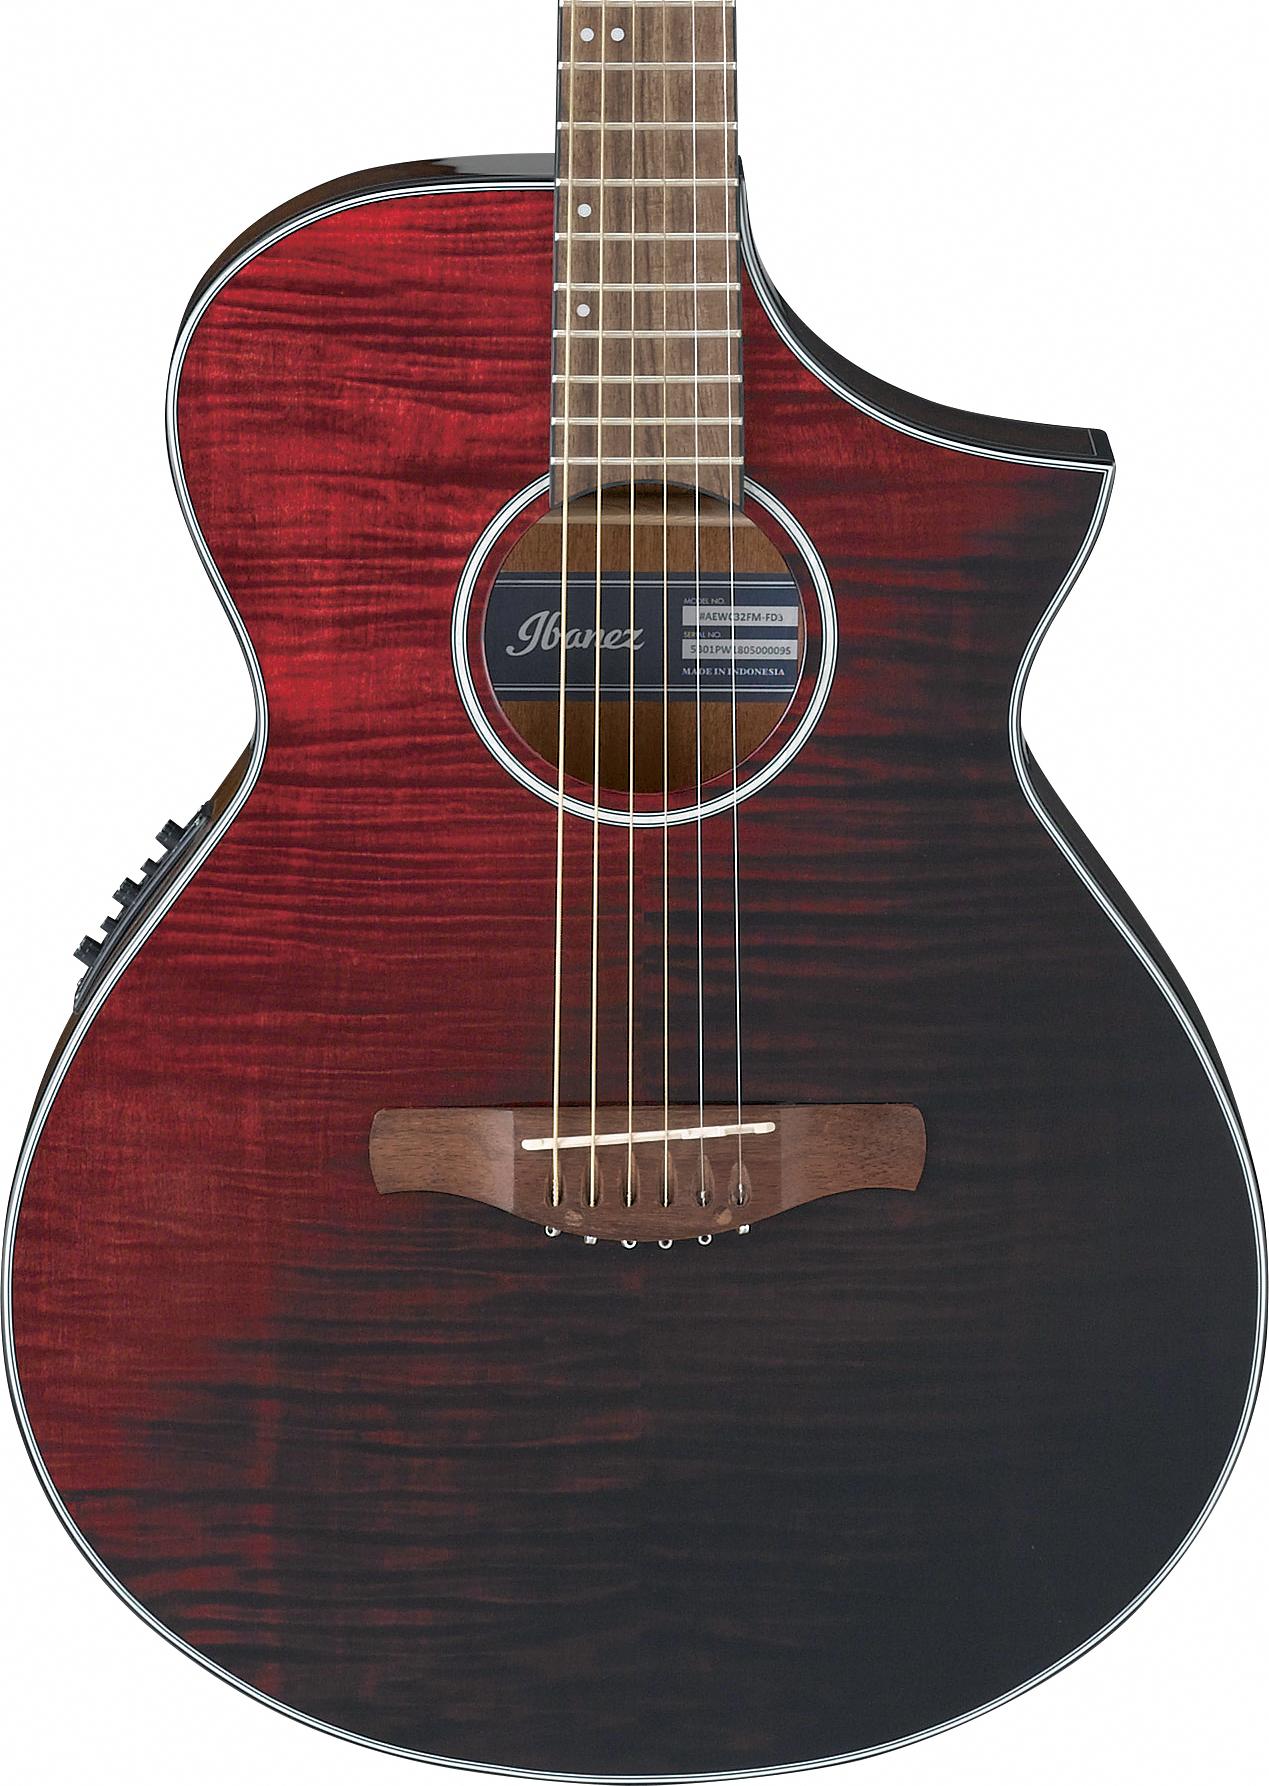 28 Marvelous Acoustic Guitar Gibson Full Size Acoustic Guitar Guitar Acoustic Guitar Kits